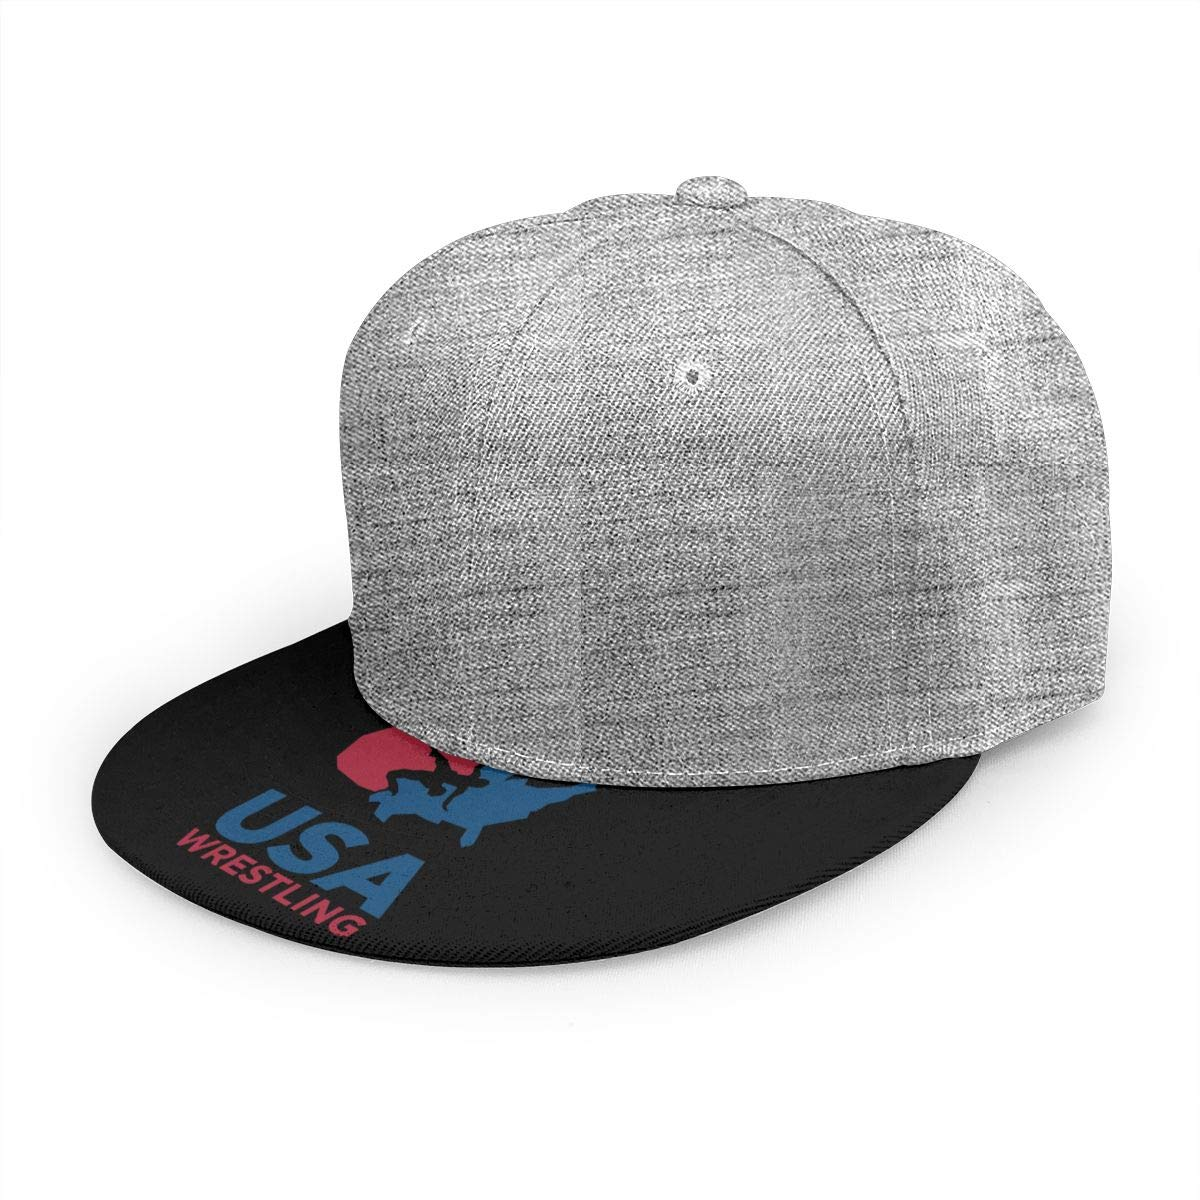 Adjustable Women Men USA Wrestling Logo Print Baseball Cap Flat Brim Cap Hats Hip Hop Snapback Sun Hat Boys Girls Gray by Apolonia